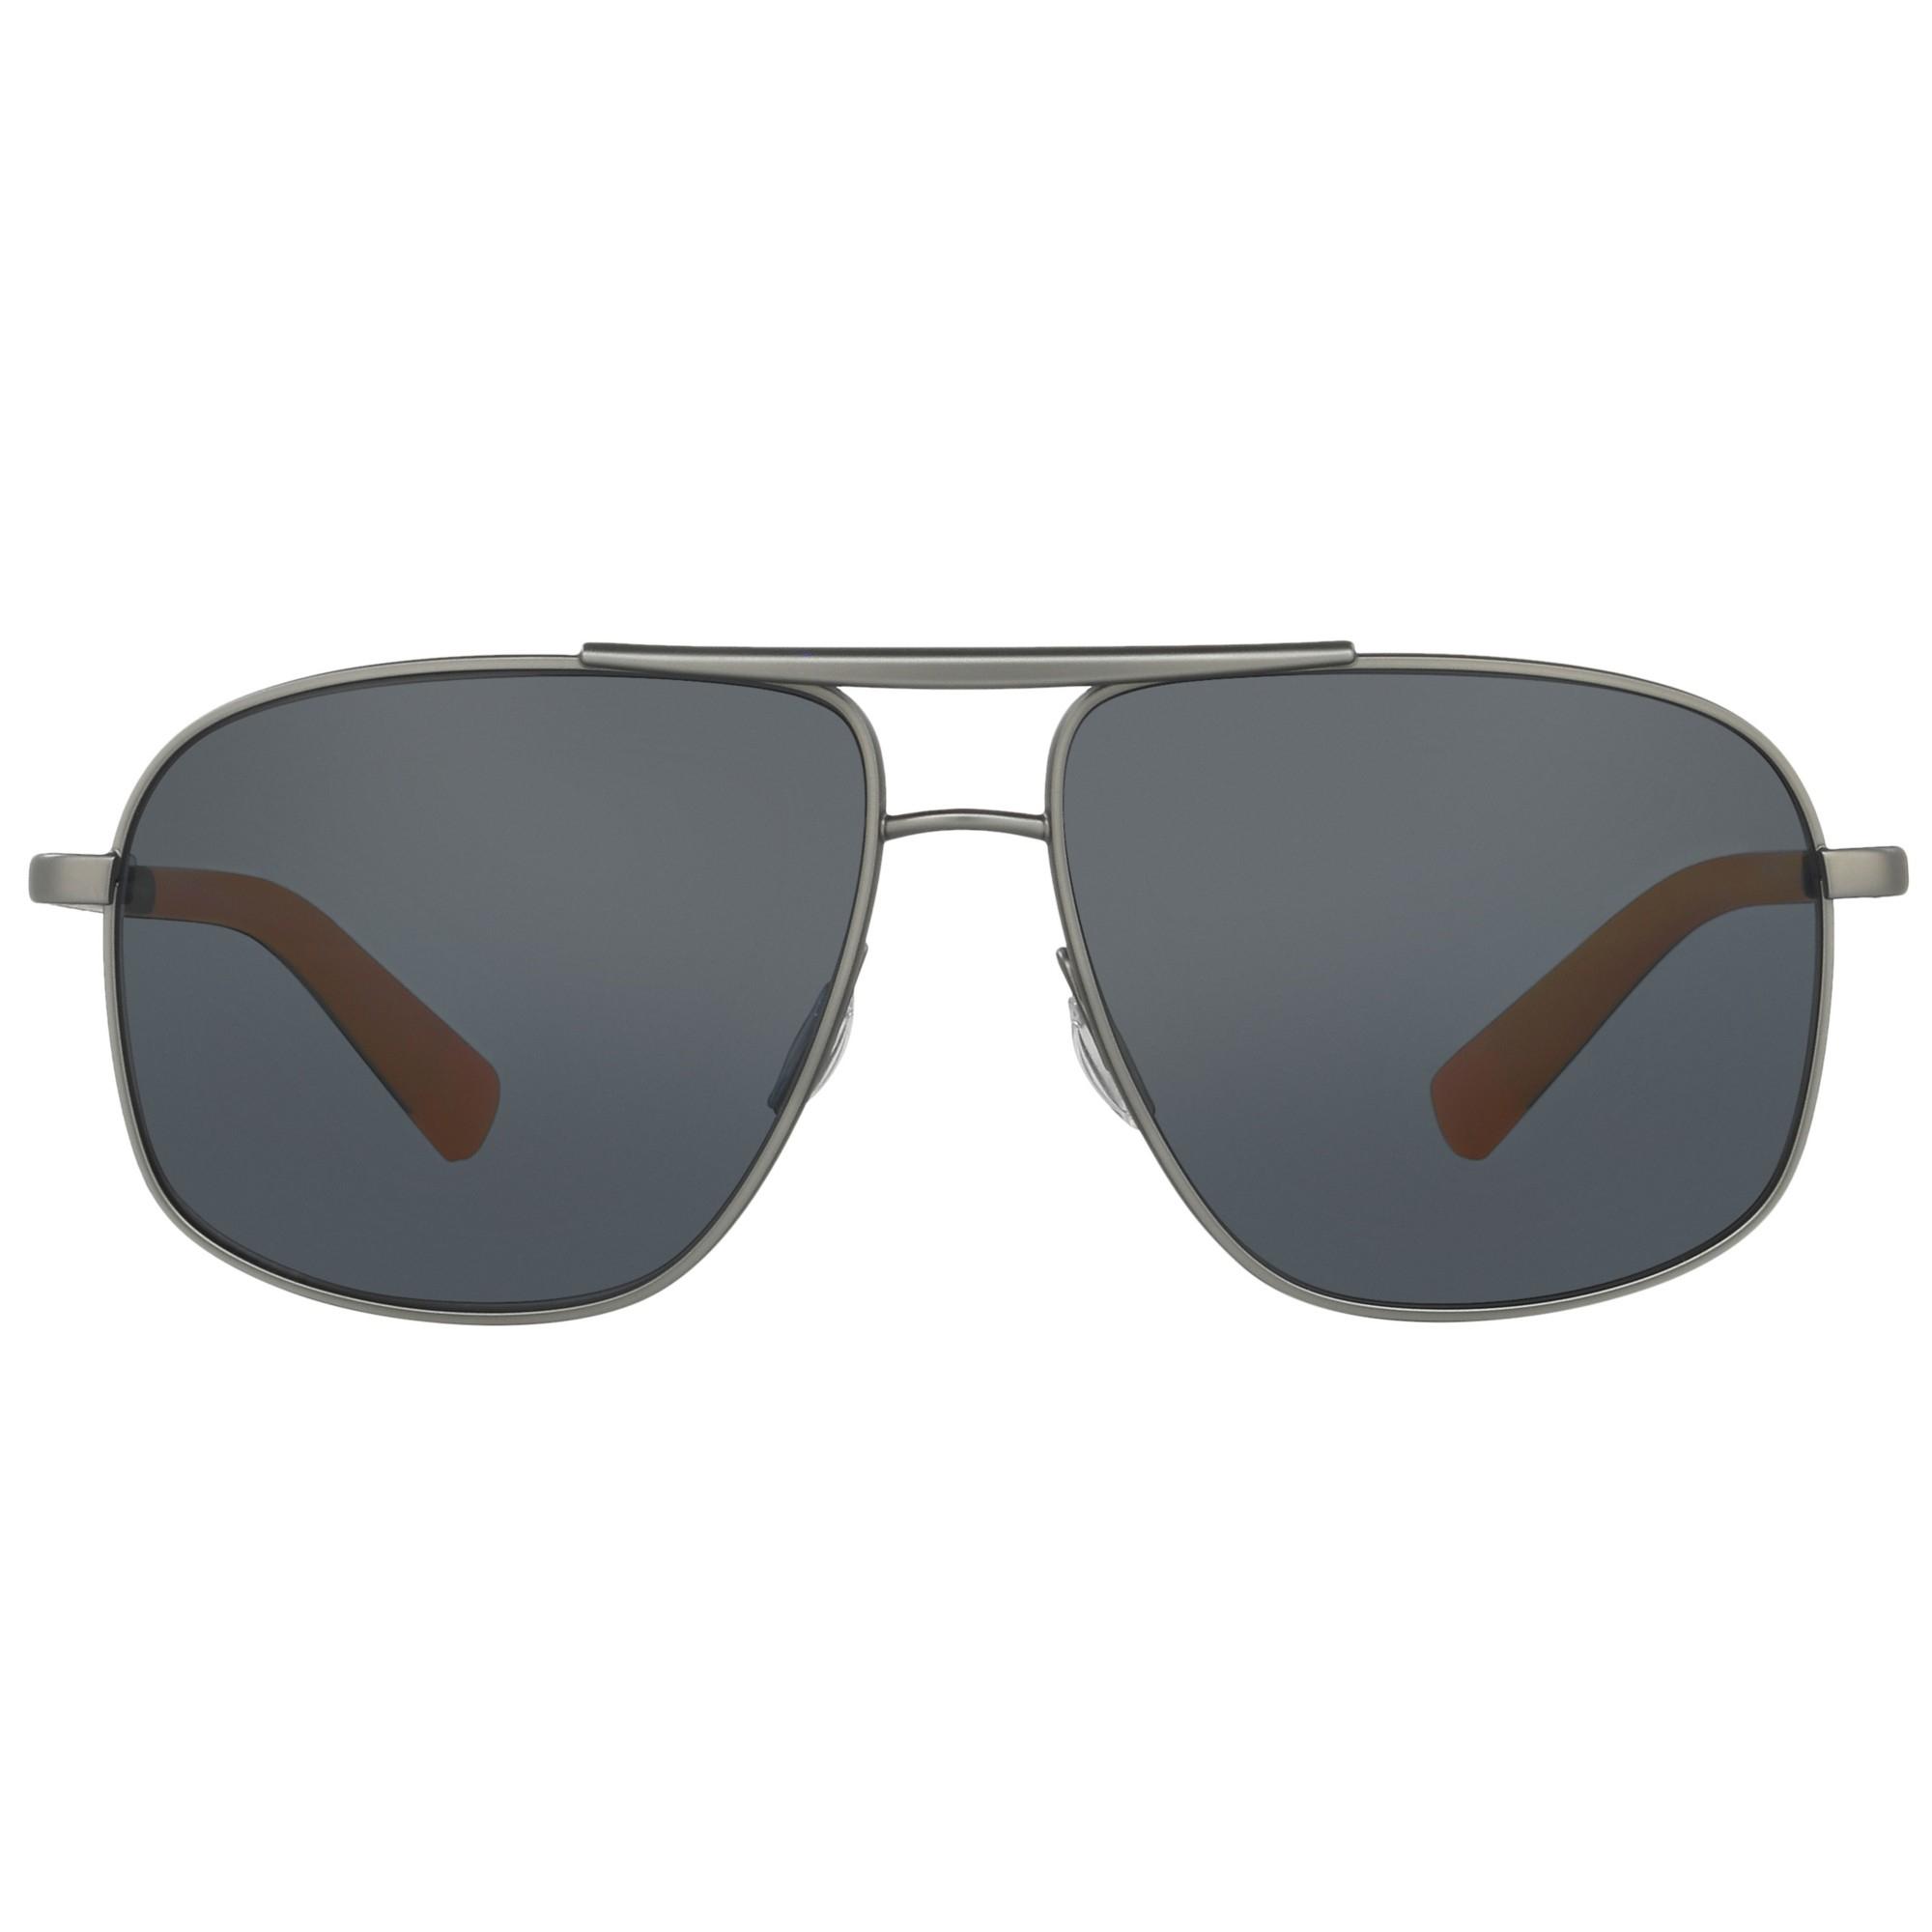 daec05e65c0b Dolce And Gabbana Sunglasses 2016